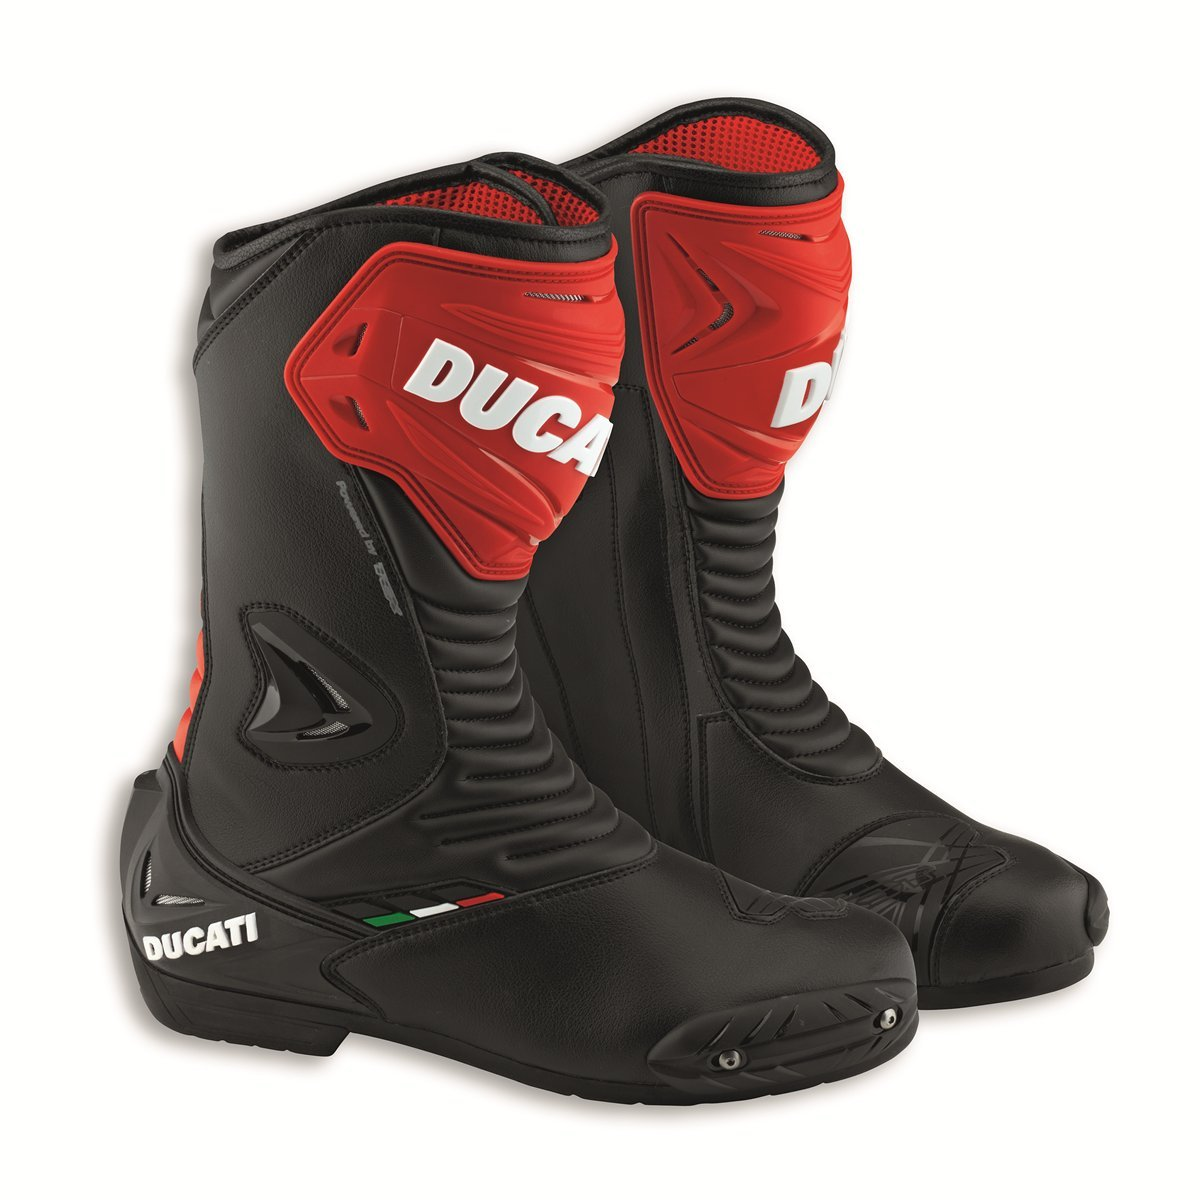 Ducati Sport 2 Racing Boots 98103174 (42)